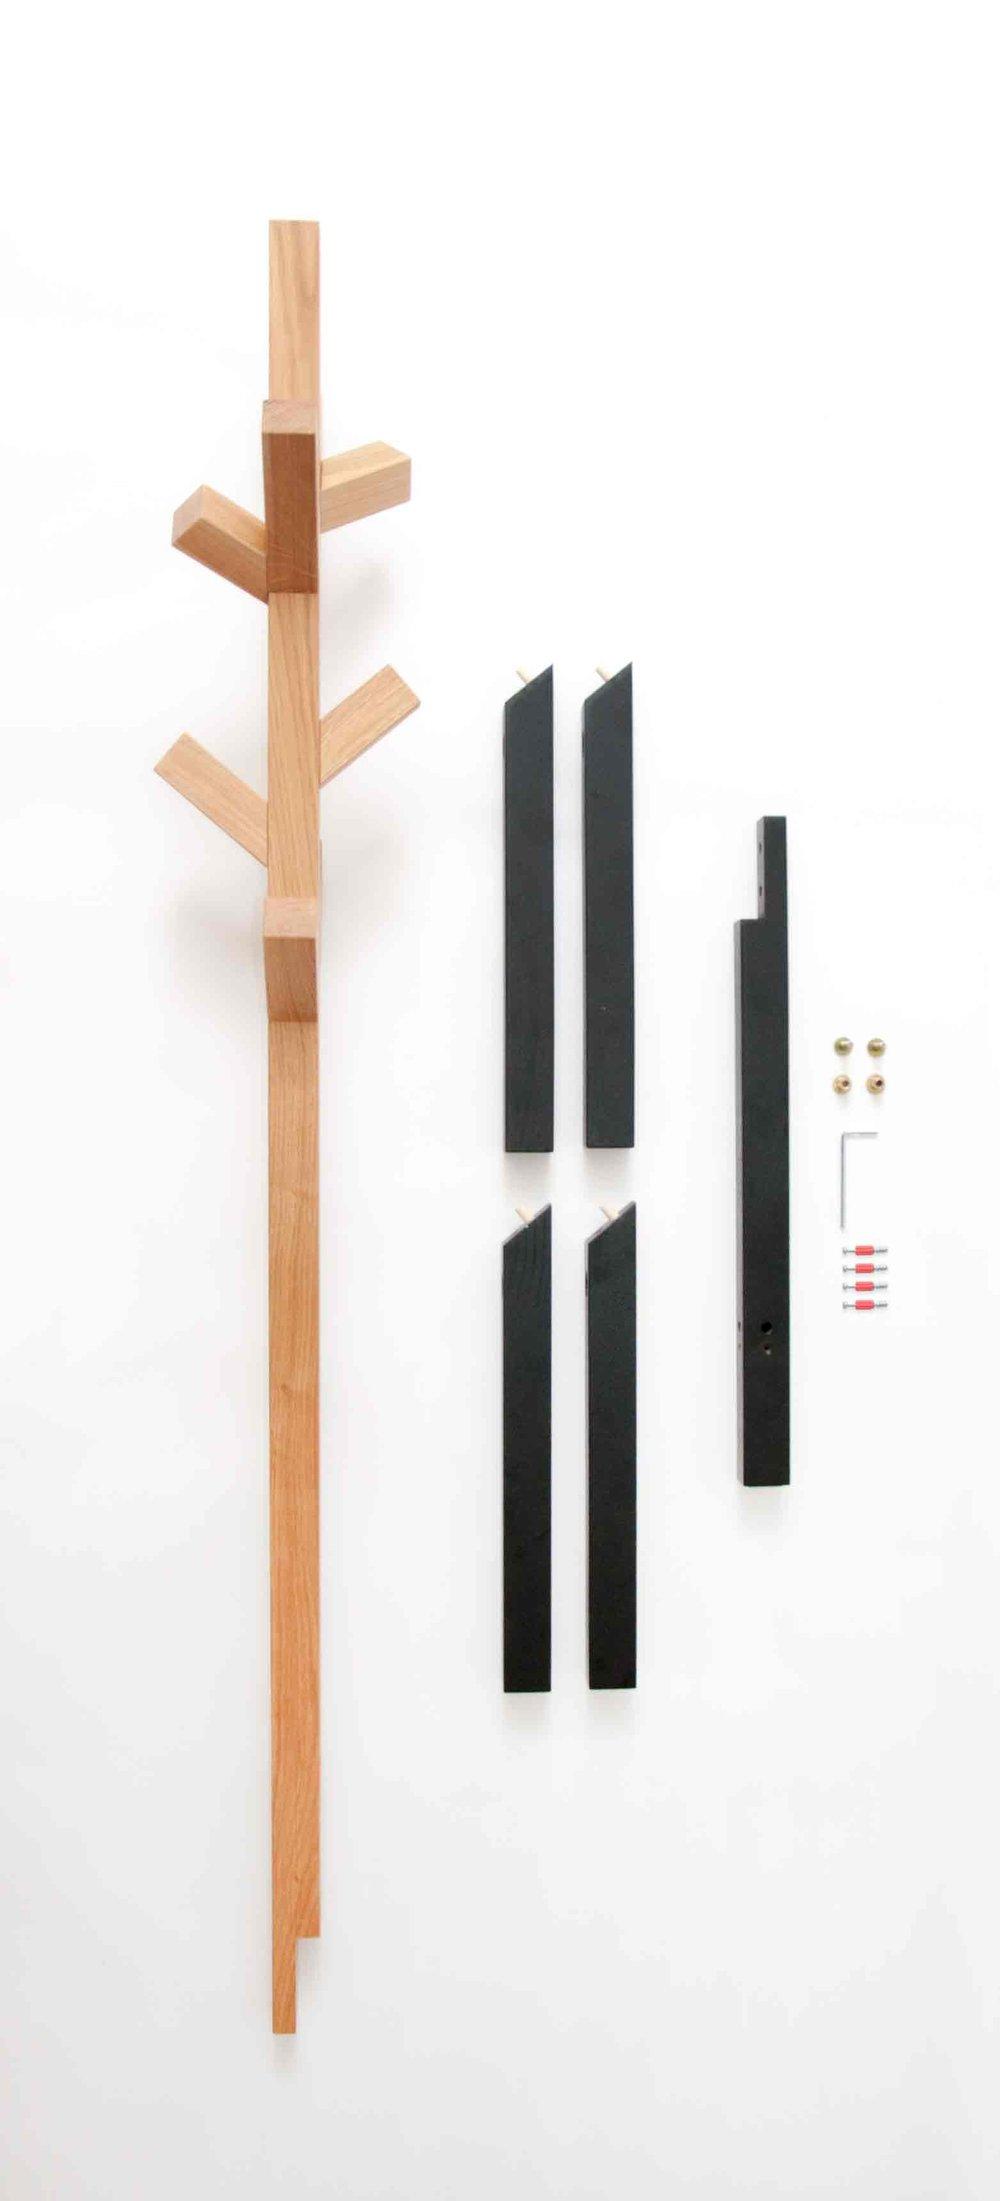 Stick_parts.jpg